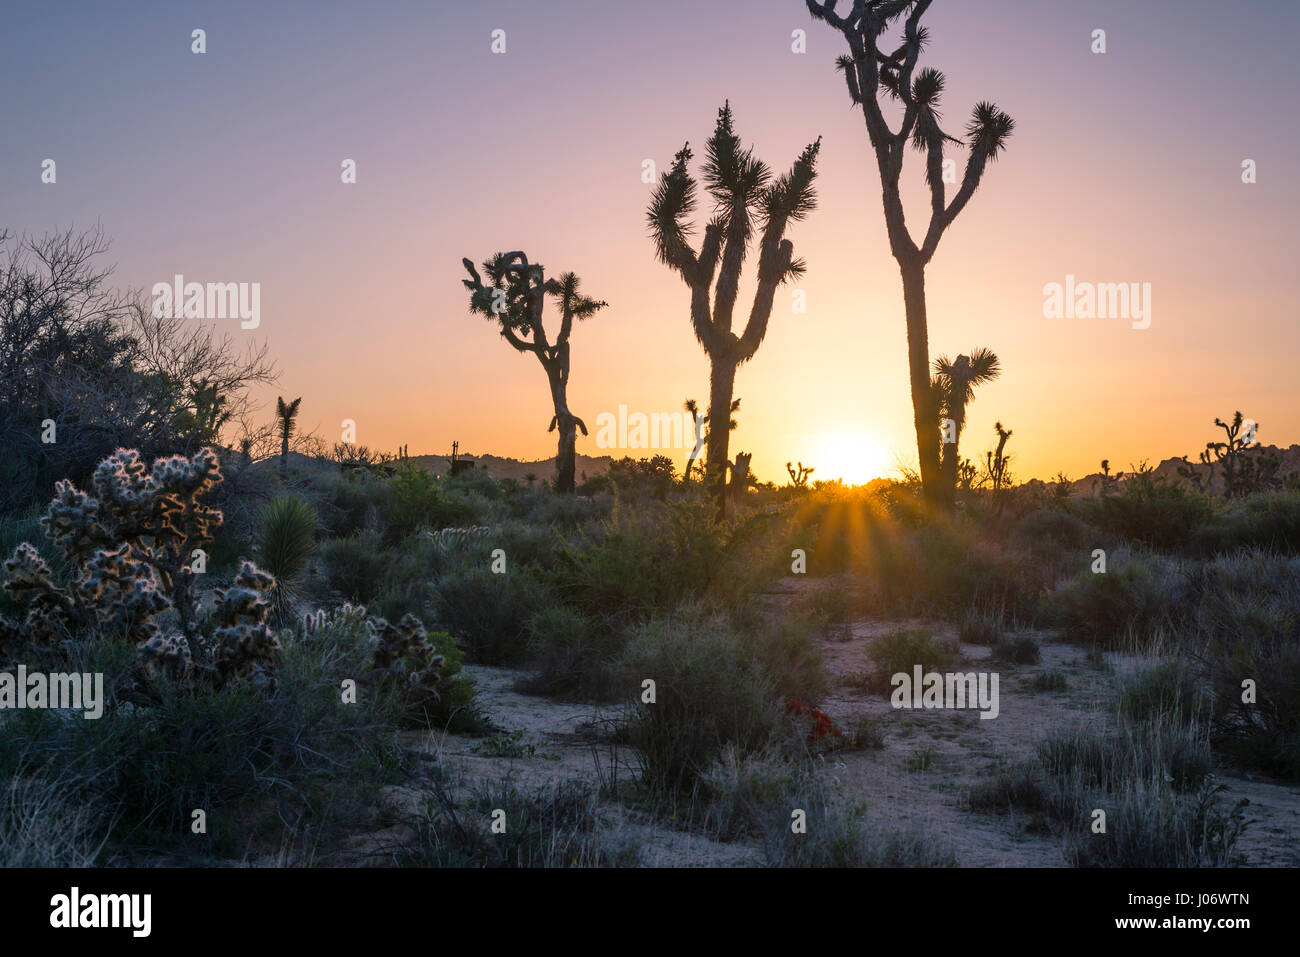 Joshua Trees and desert landscape at sunrise. Joshua Tree National Park, California, USA. - Stock Image